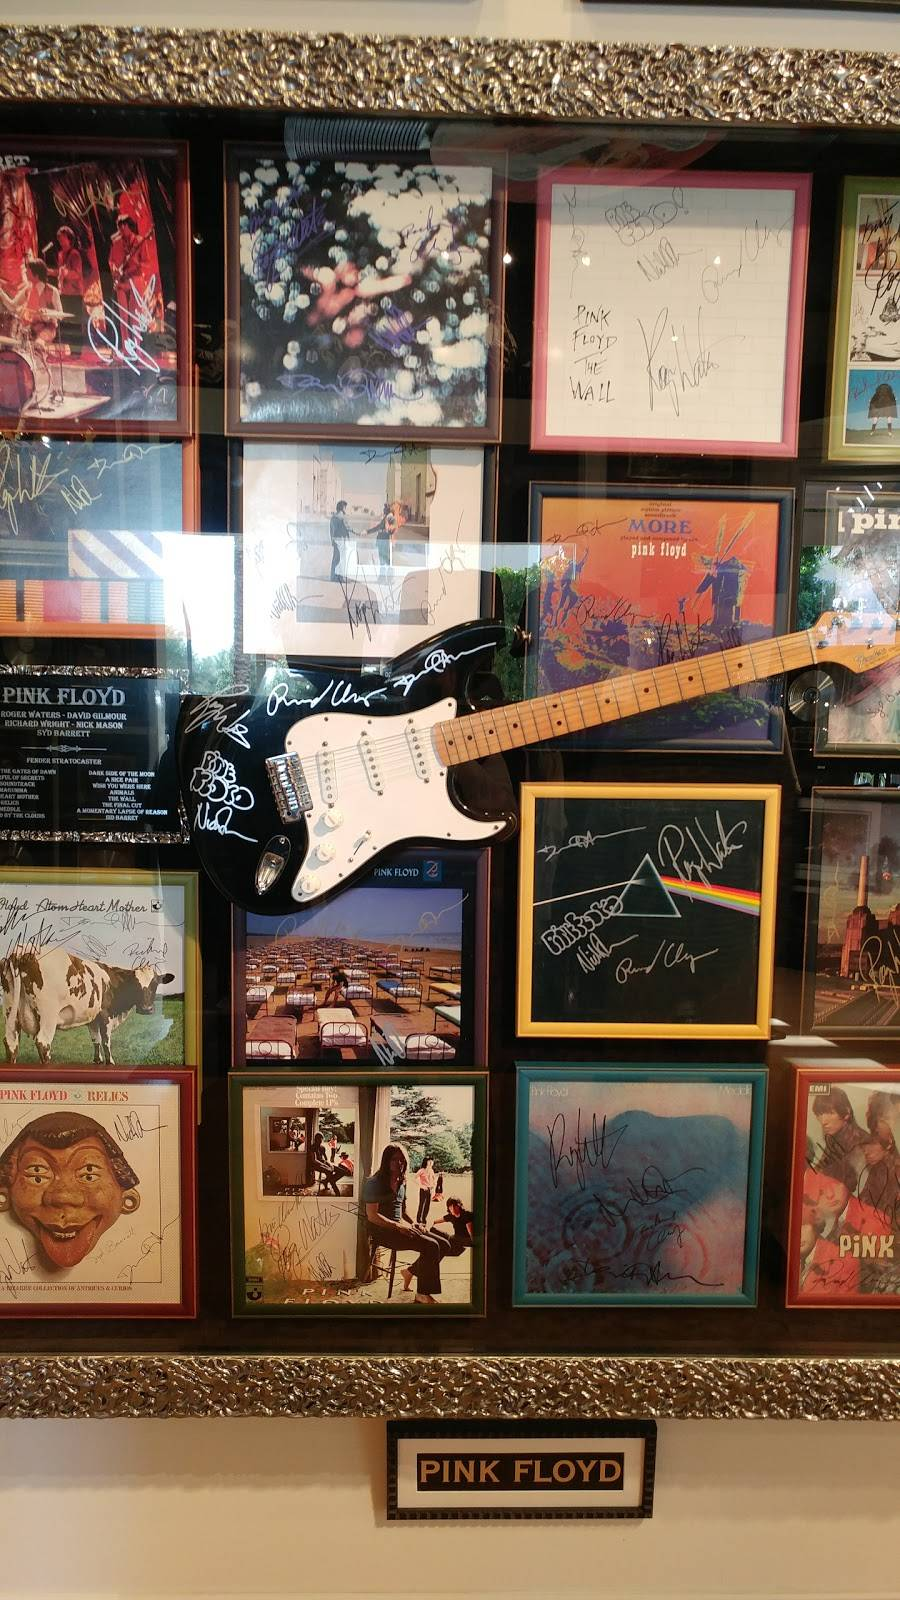 ROCK STAR gallery - shopping mall  | Photo 3 of 7 | Address: 15211 N Kierland Blvd #160, Scottsdale, AZ 85254, USA | Phone: (480) 275-4501